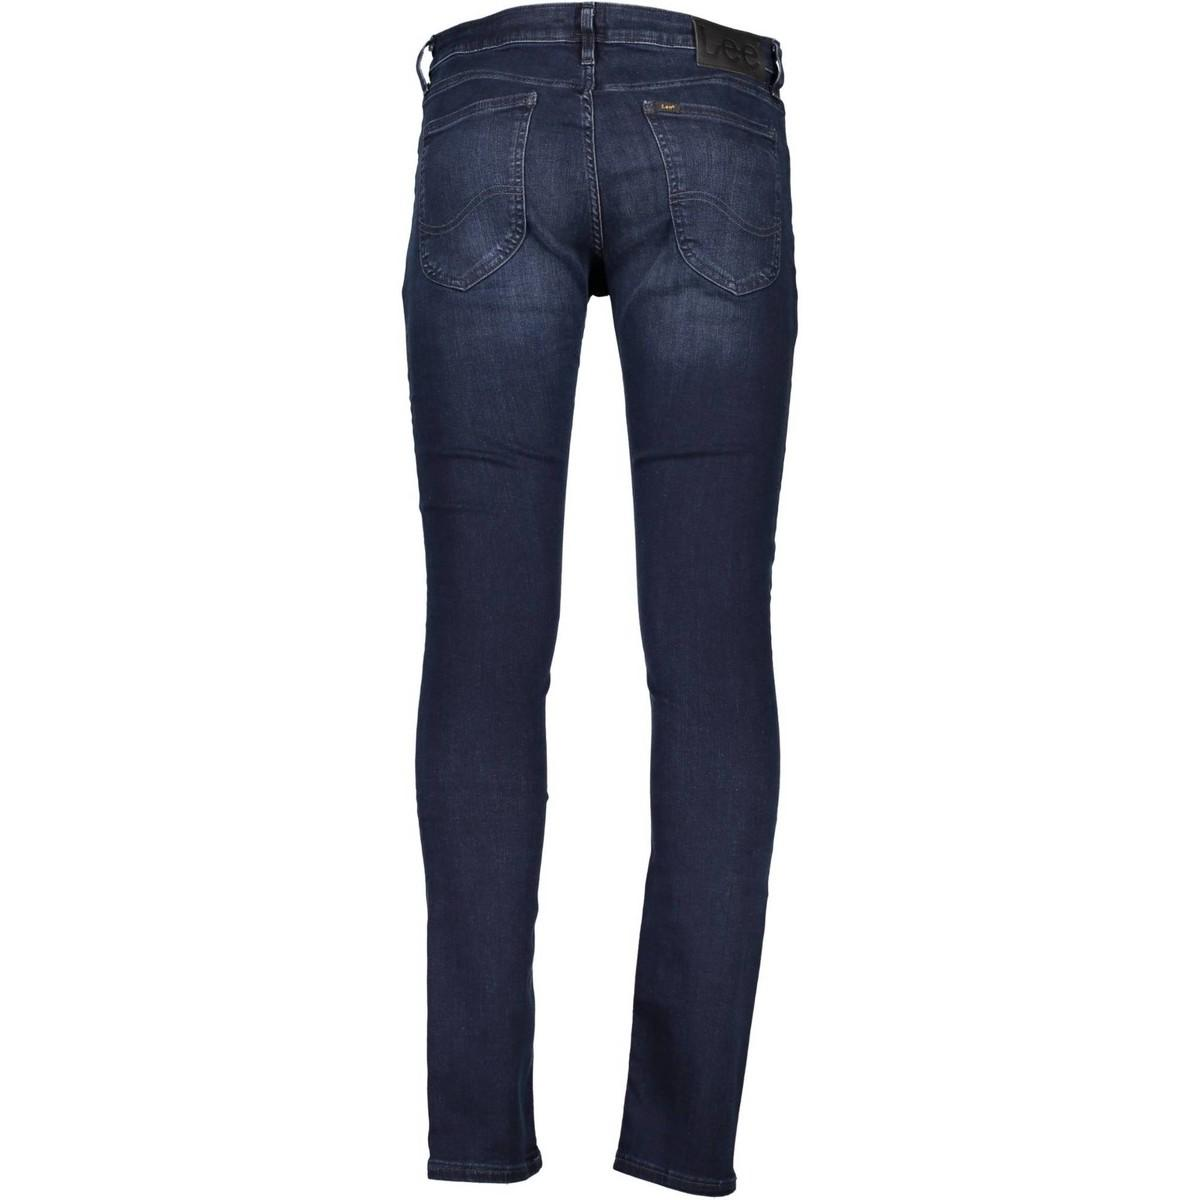 Lee Jeans Denim Straight Jeans L736kjma Malone in het Blauw voor heren